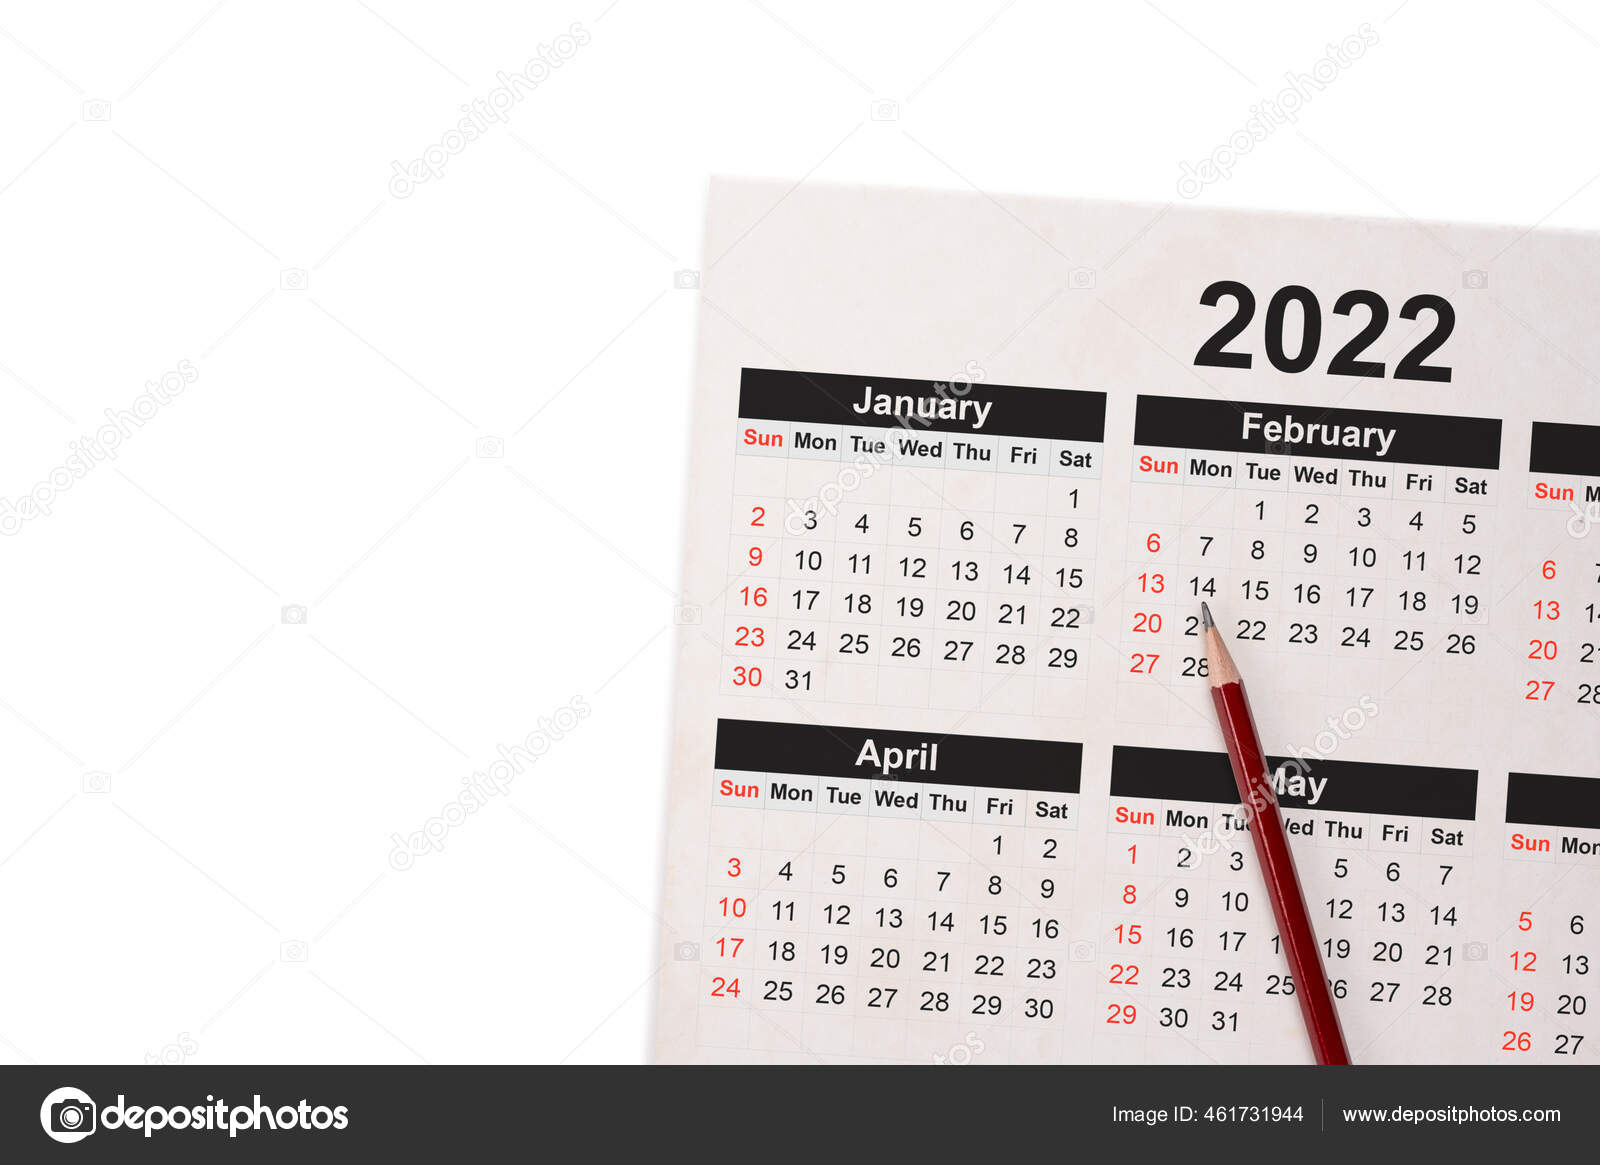 Appointment Calendar 2022.Close Pencil Calendar 2022 Close Pencil Calendar White Using Writing Stock Photo Image By C Celt Sarmat Gmail Com 461731944